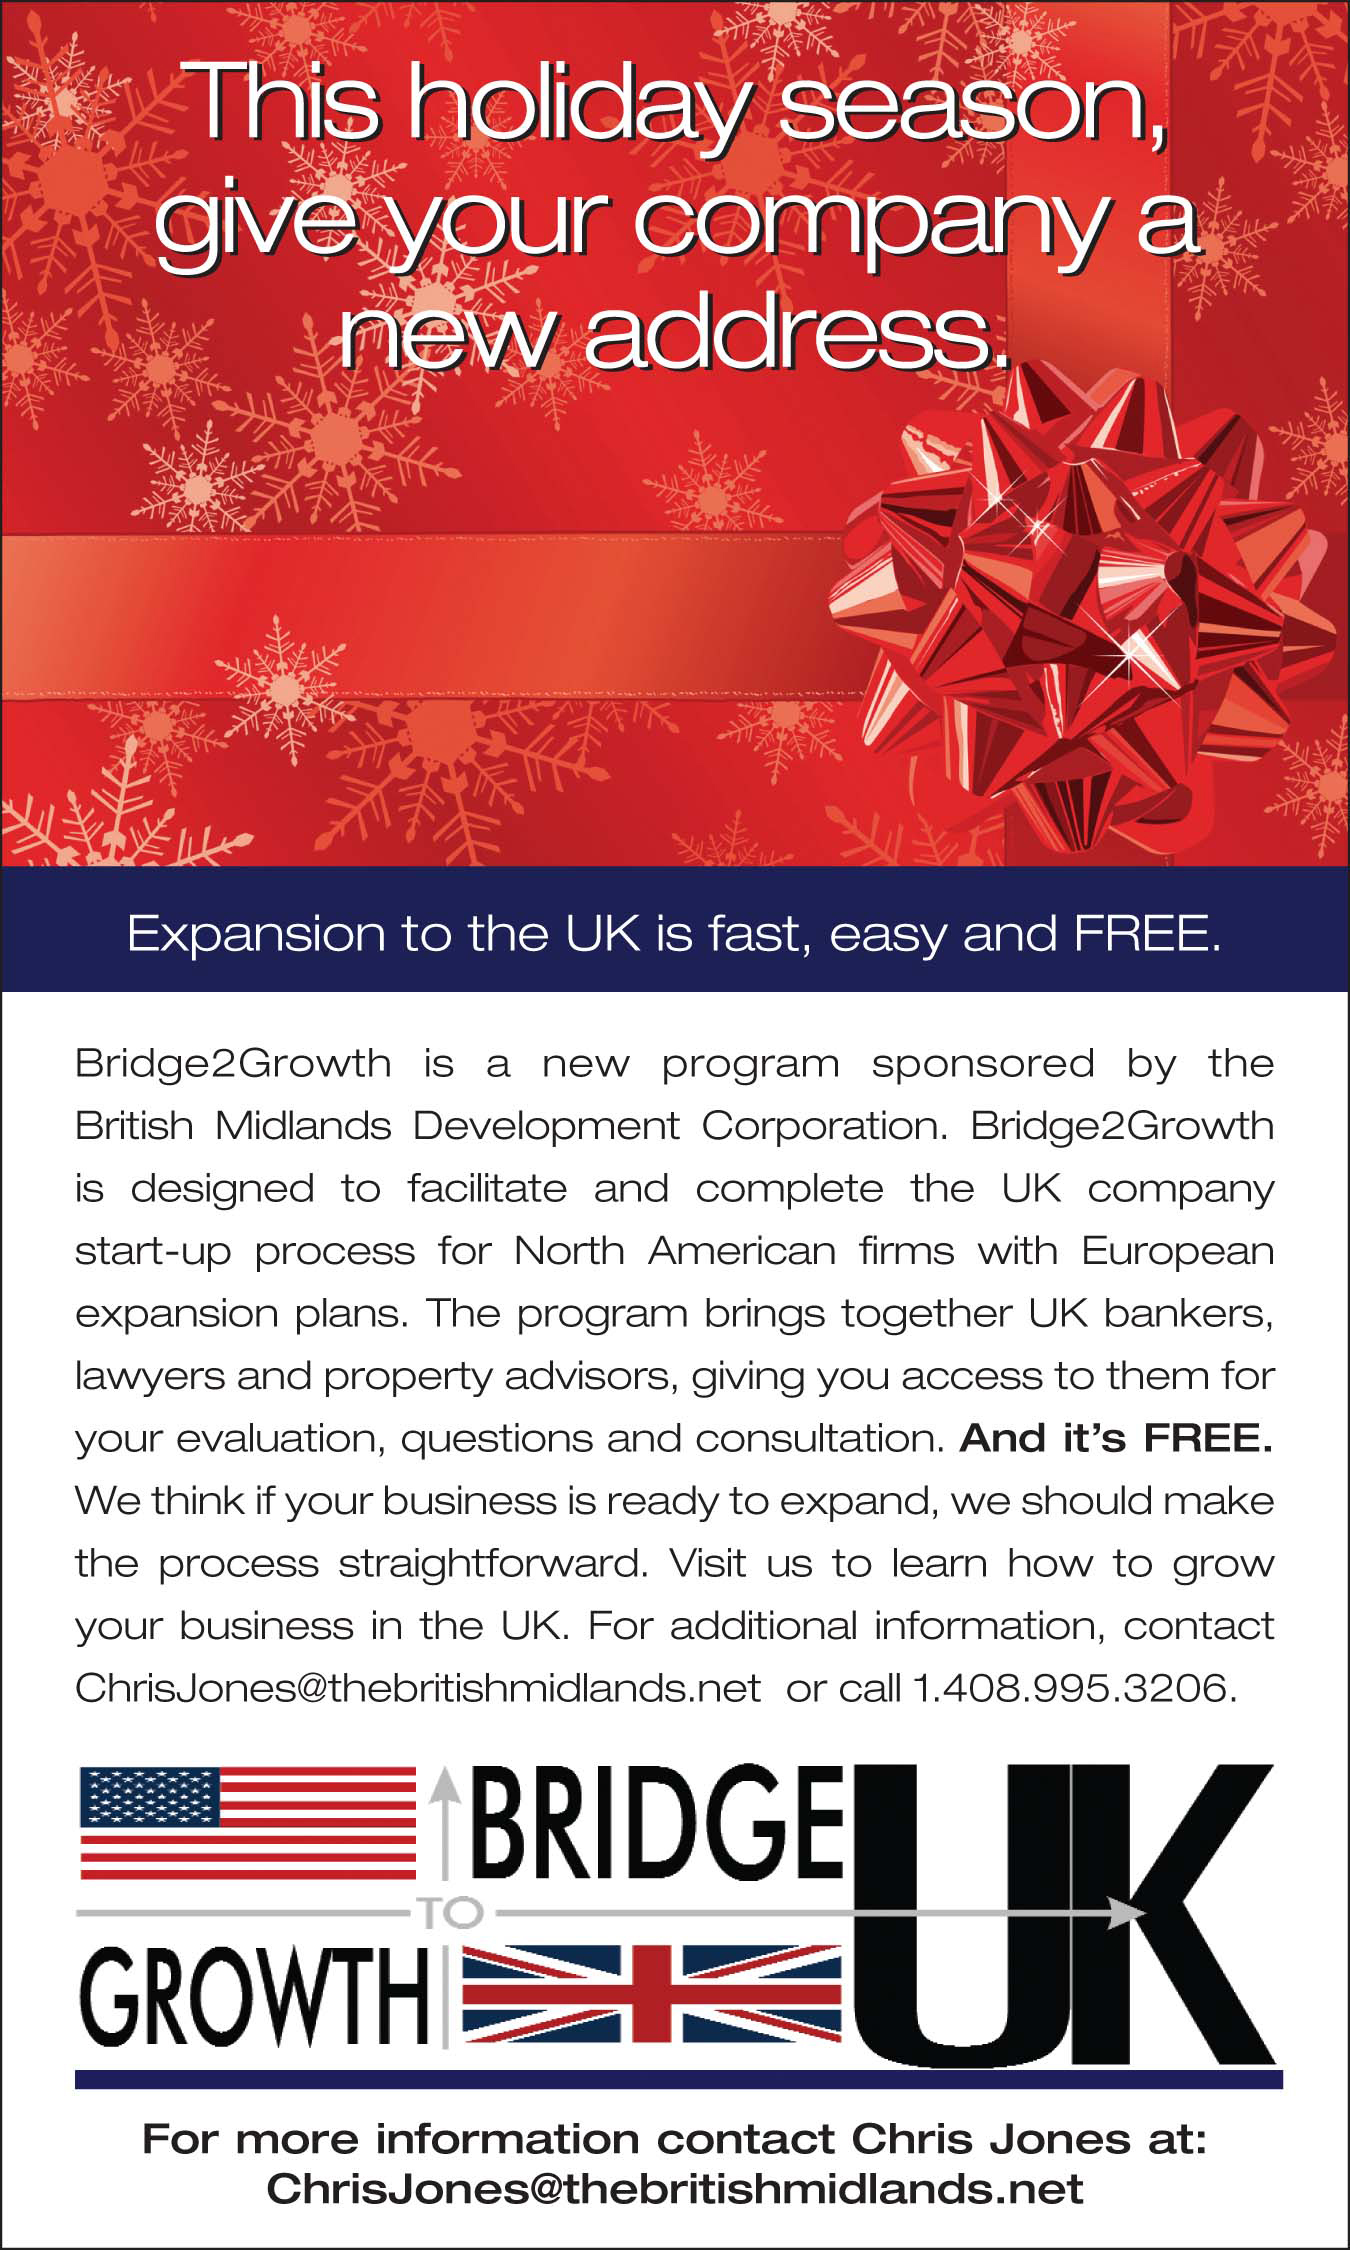 Bridge-to-Growth Holiday Ad.jpg